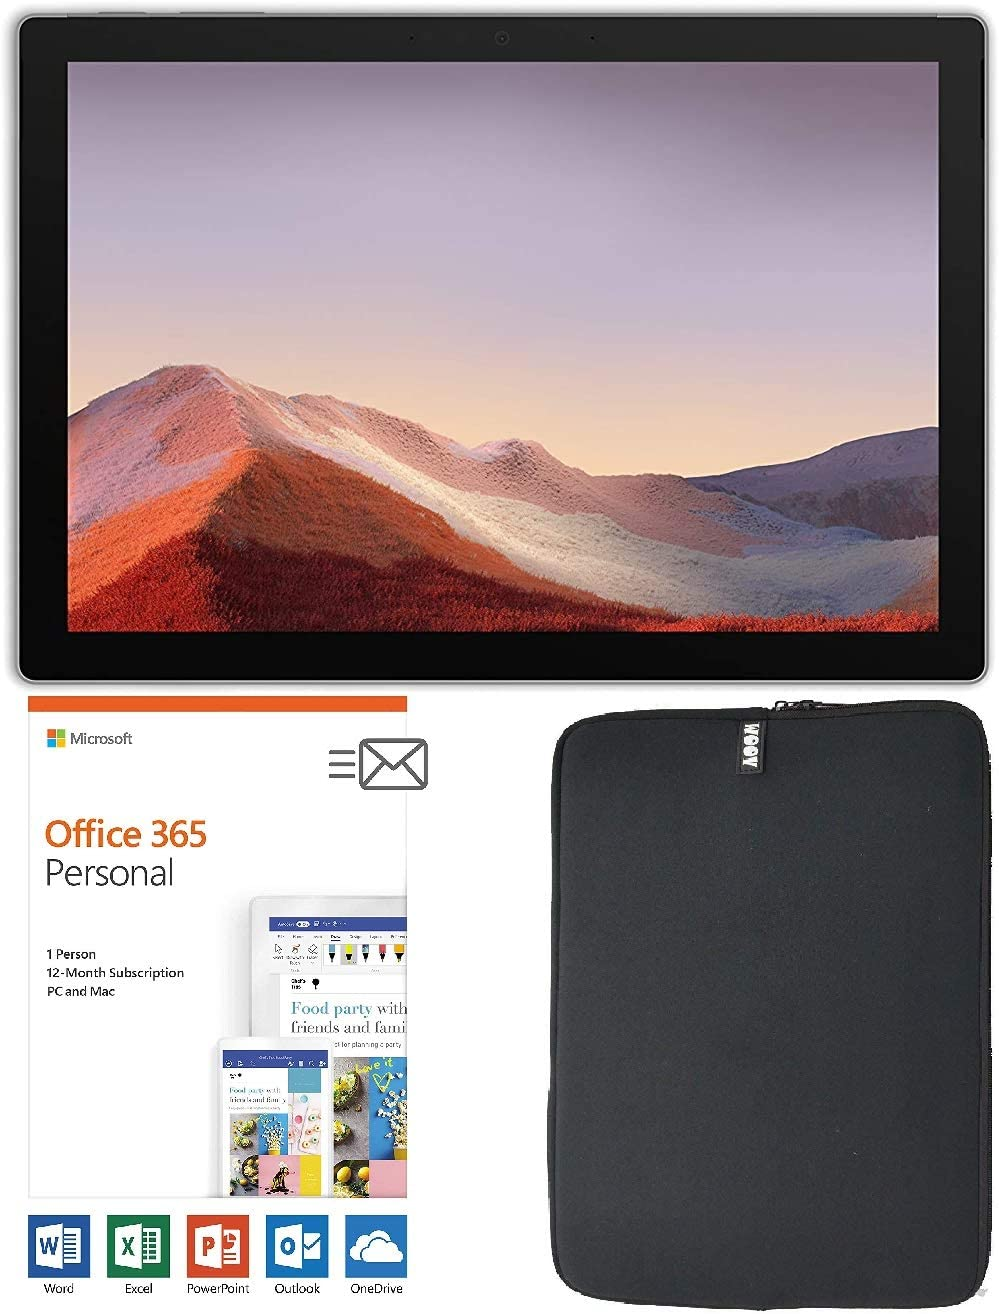 Newest Microsoft Surface Pro 7 12.3 Inch Touchscreen Tablet PC Bundle w/Office 365 (1 Year) & WOOV Sleeve, Intel 10th Gen Core i5, 8GB RAM, 128GB SSD, Windows 10, Platinum (Latest Model)